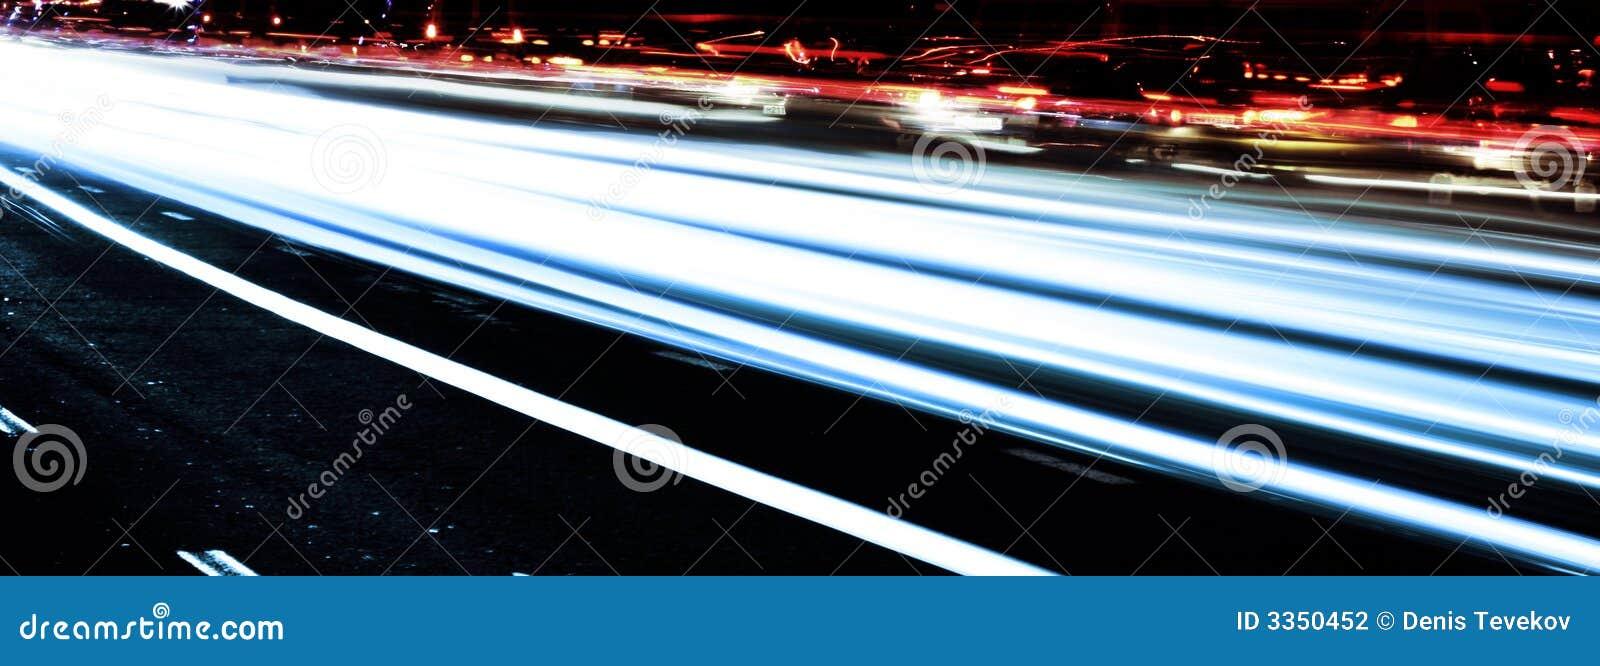 Tiro da velocidade e da noite